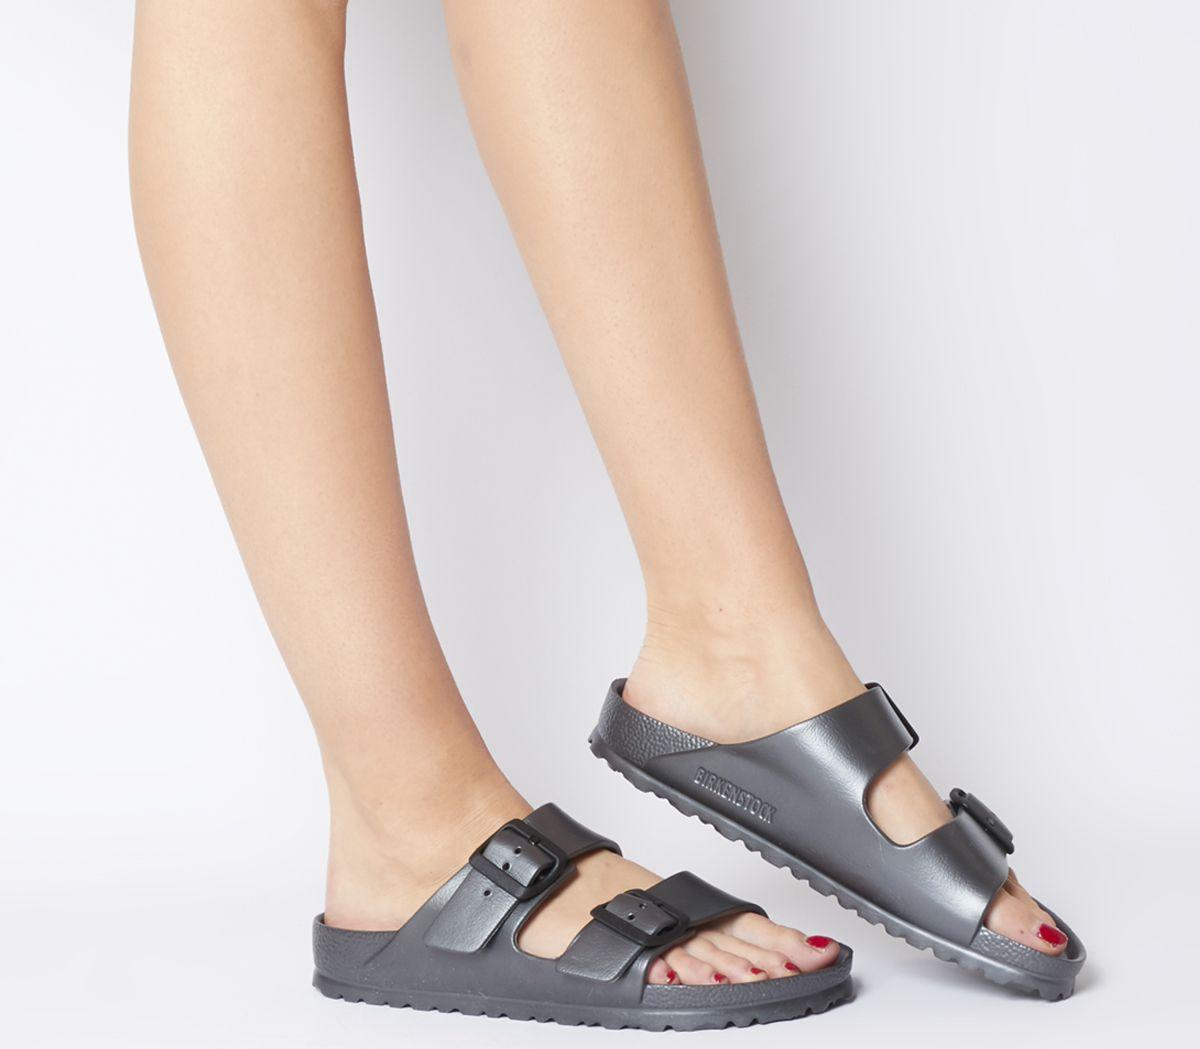 05d2e744ded3 Birkenstock Arizona Two Strap Sandals Metallic Anthracite Eva - Sandals